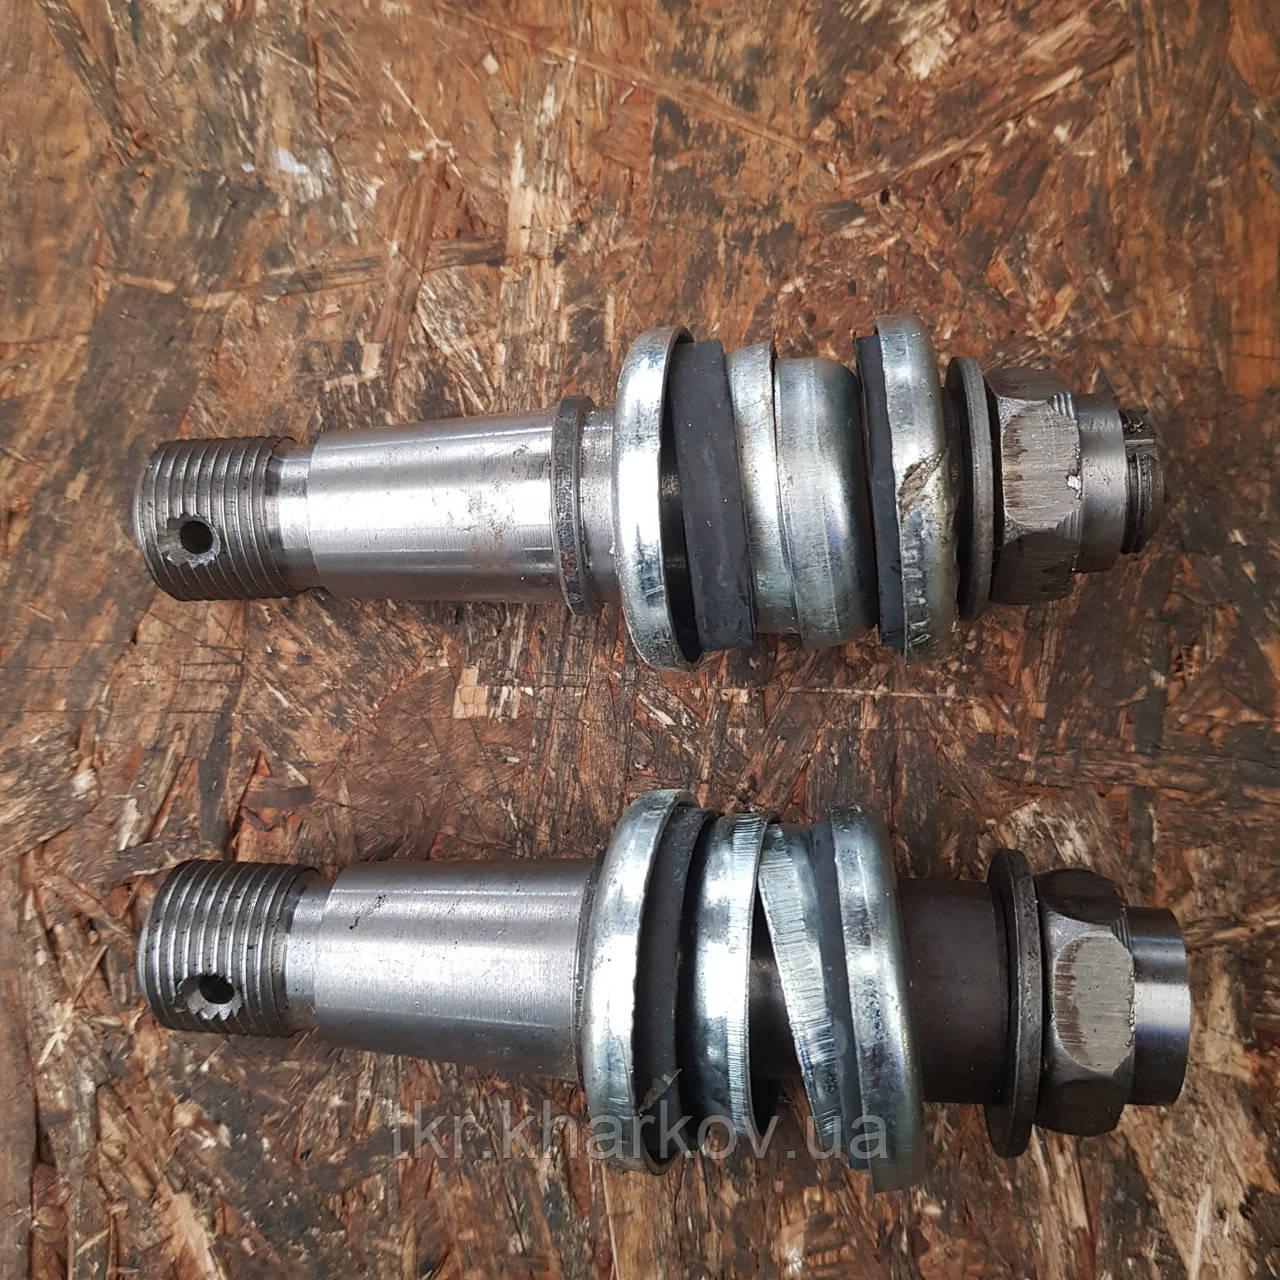 Пальцы рулевого гидроцилиндра МТЗ-80 (Д-240)